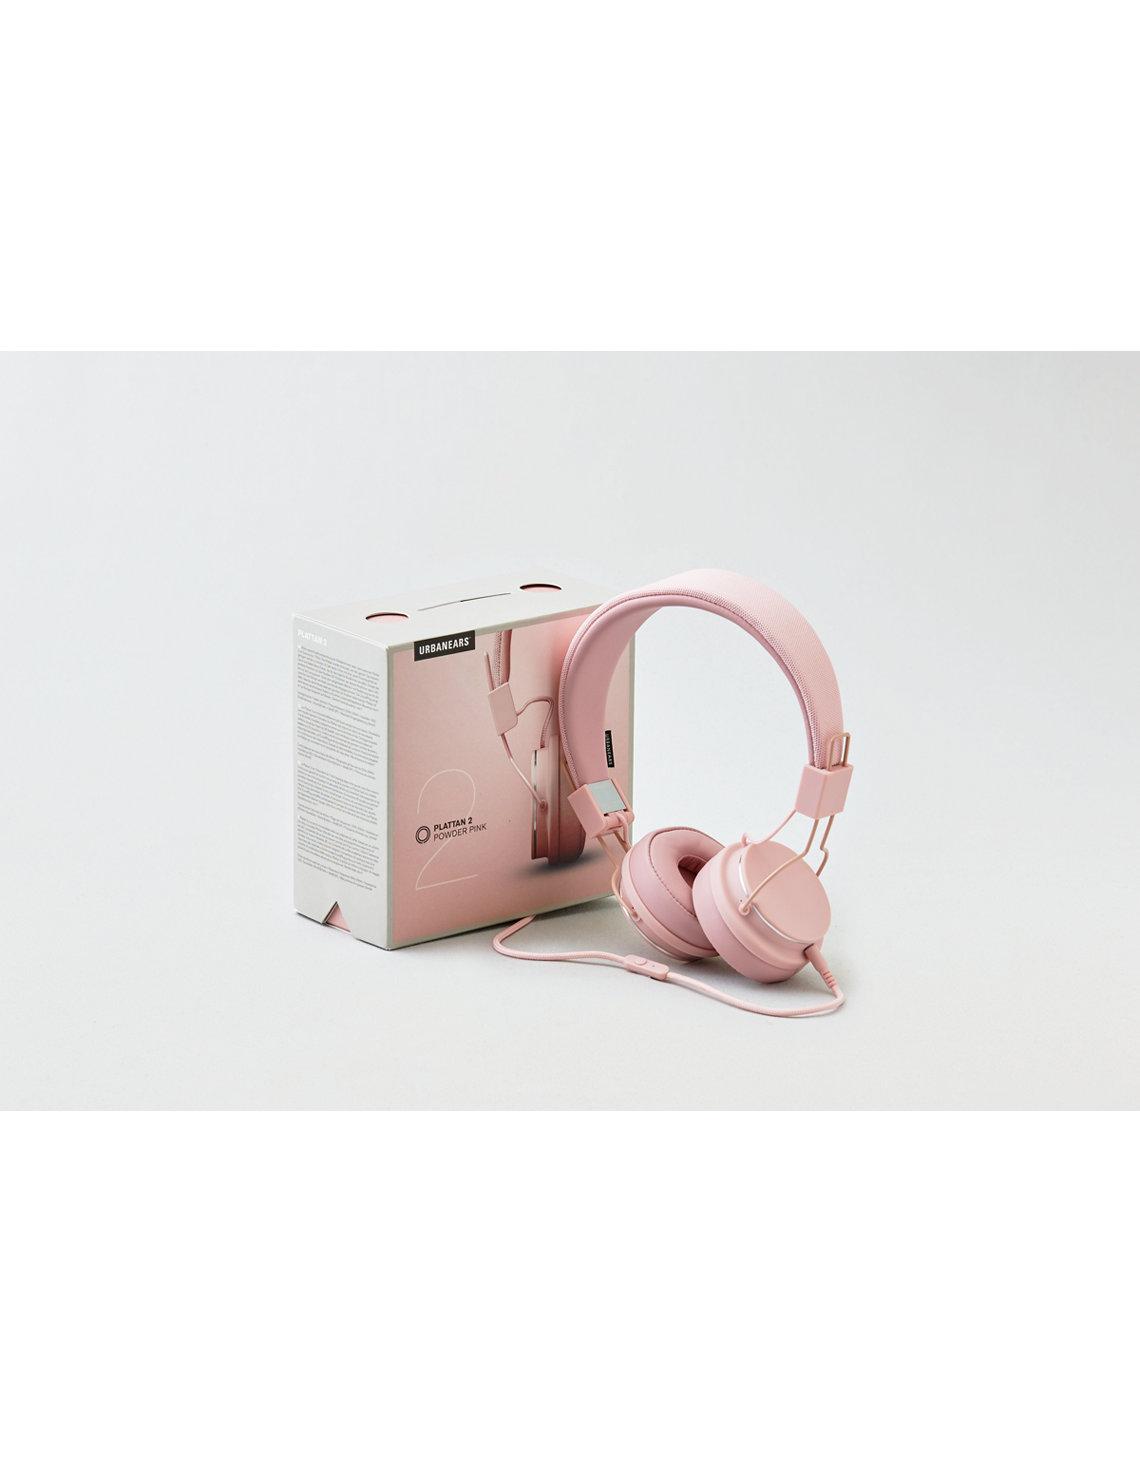 Urbanears Plattan Vit Finns P Ii Snow Blue 2 Headphones Pink